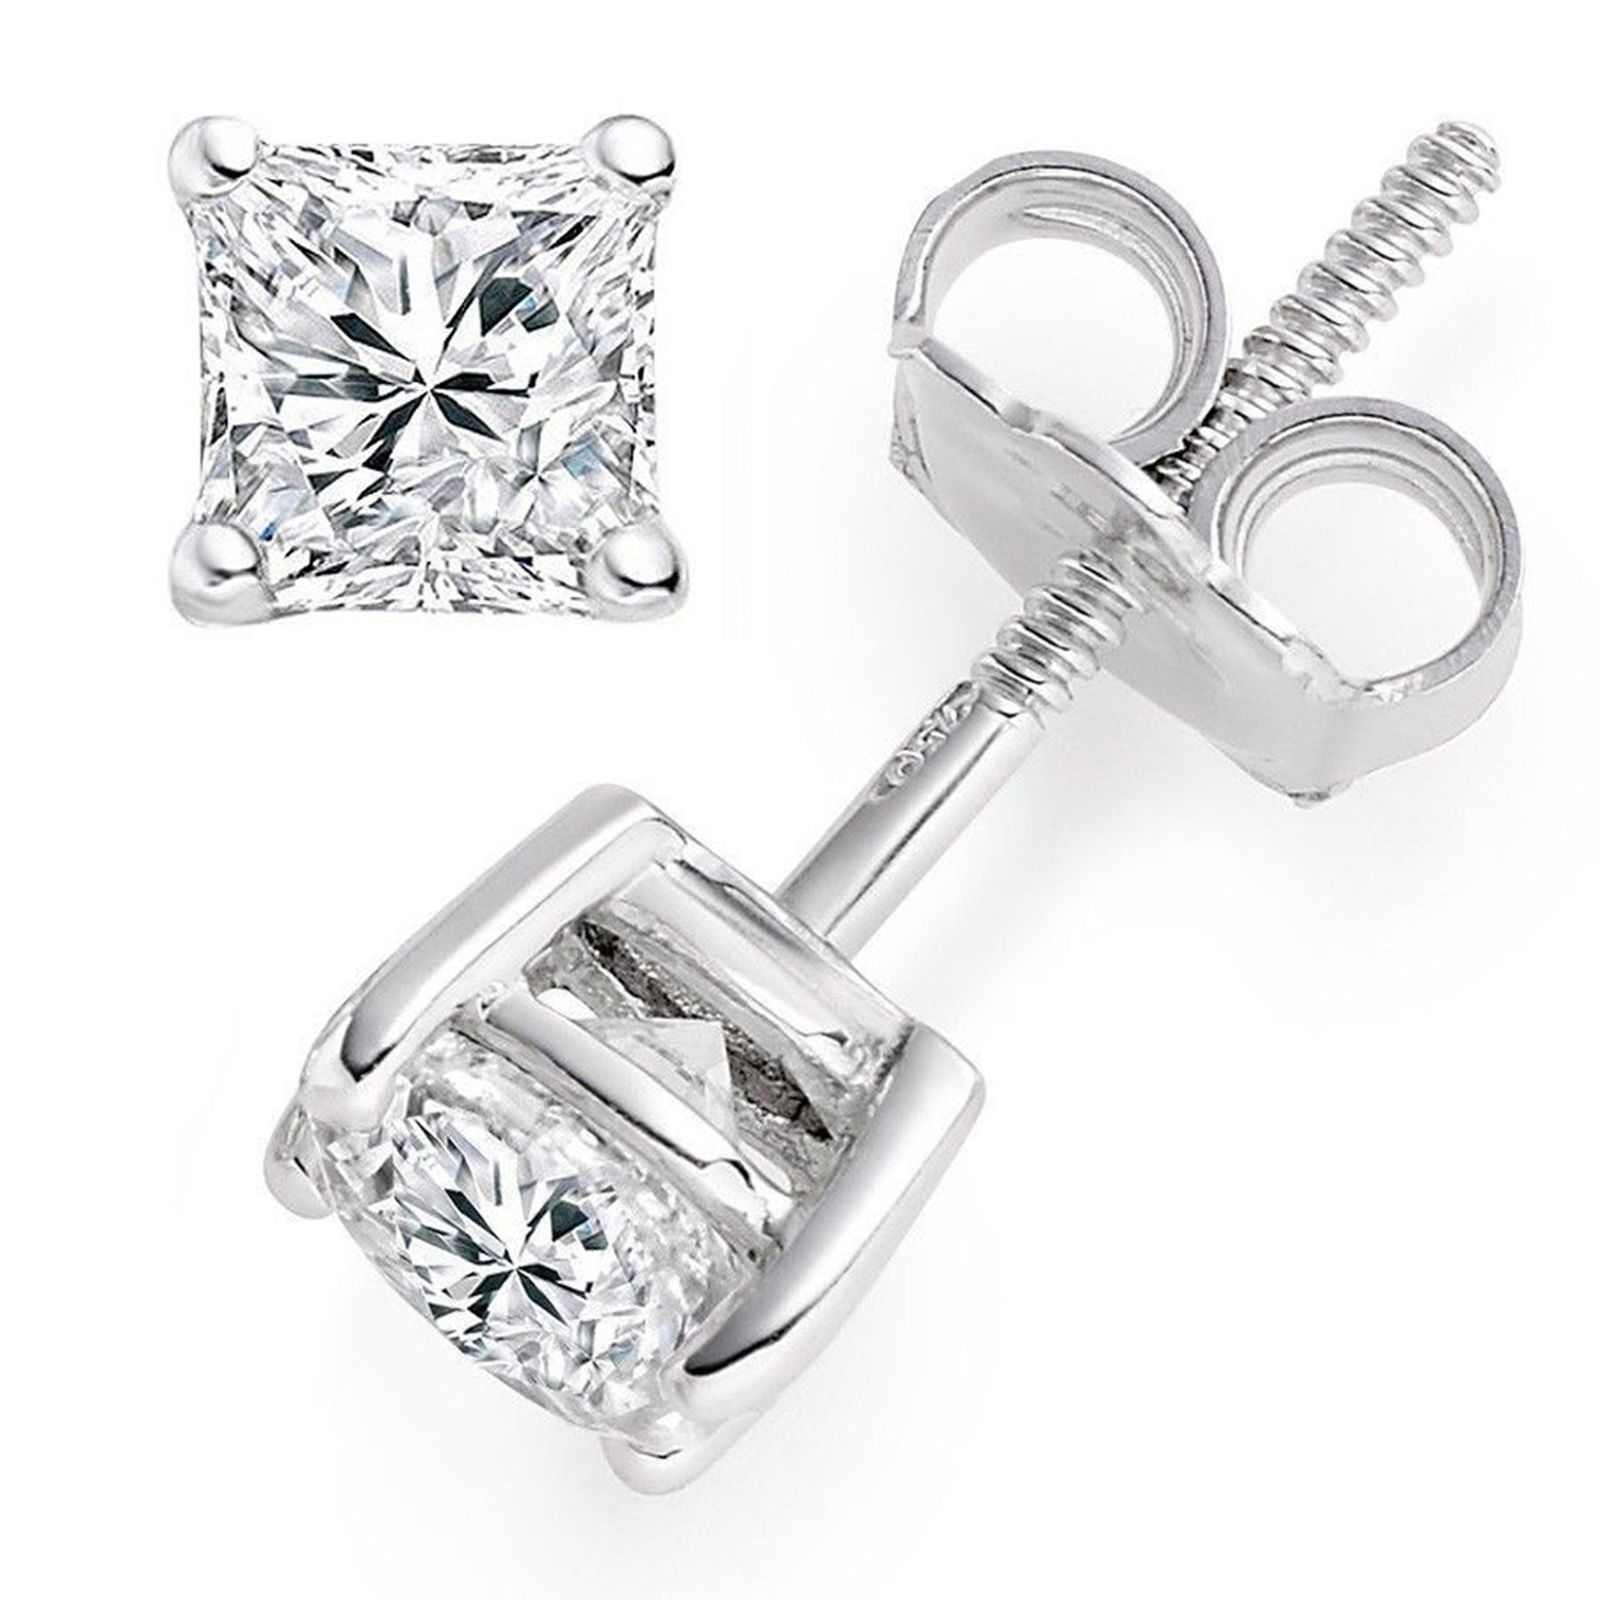 Diamond 1 Ct Princess Cut Solitaire Stud Earrings Solid 14K